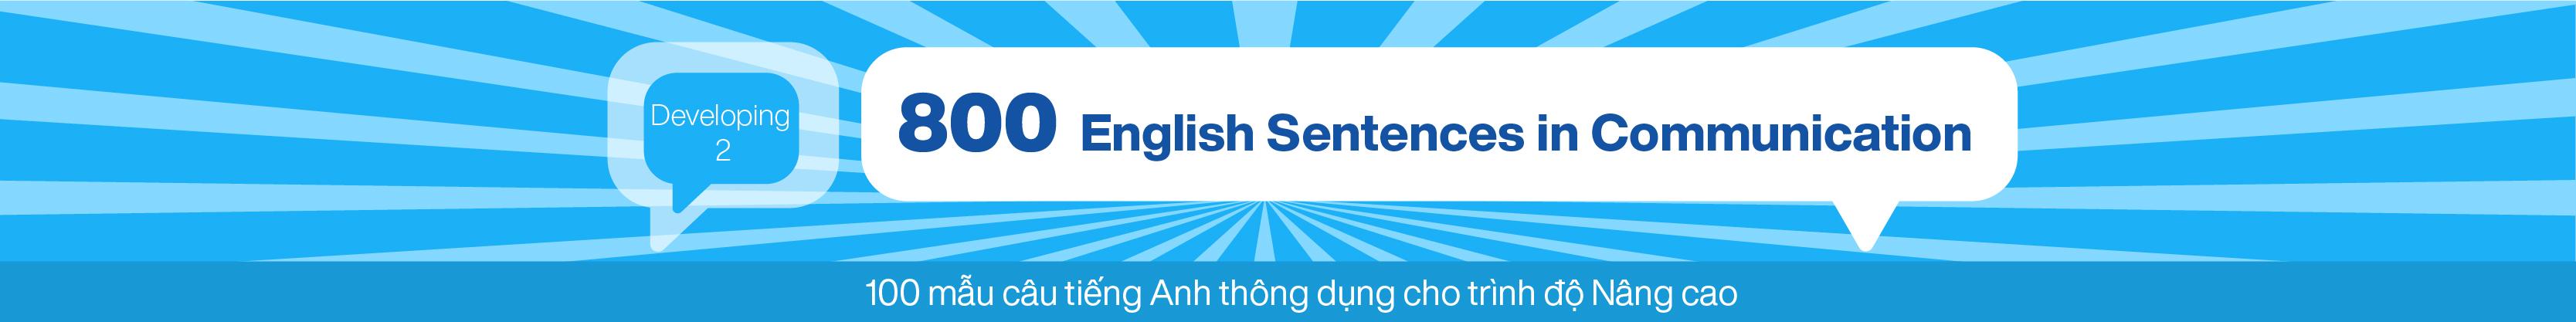 800 English Sentences in Communication (Developing 2) banner